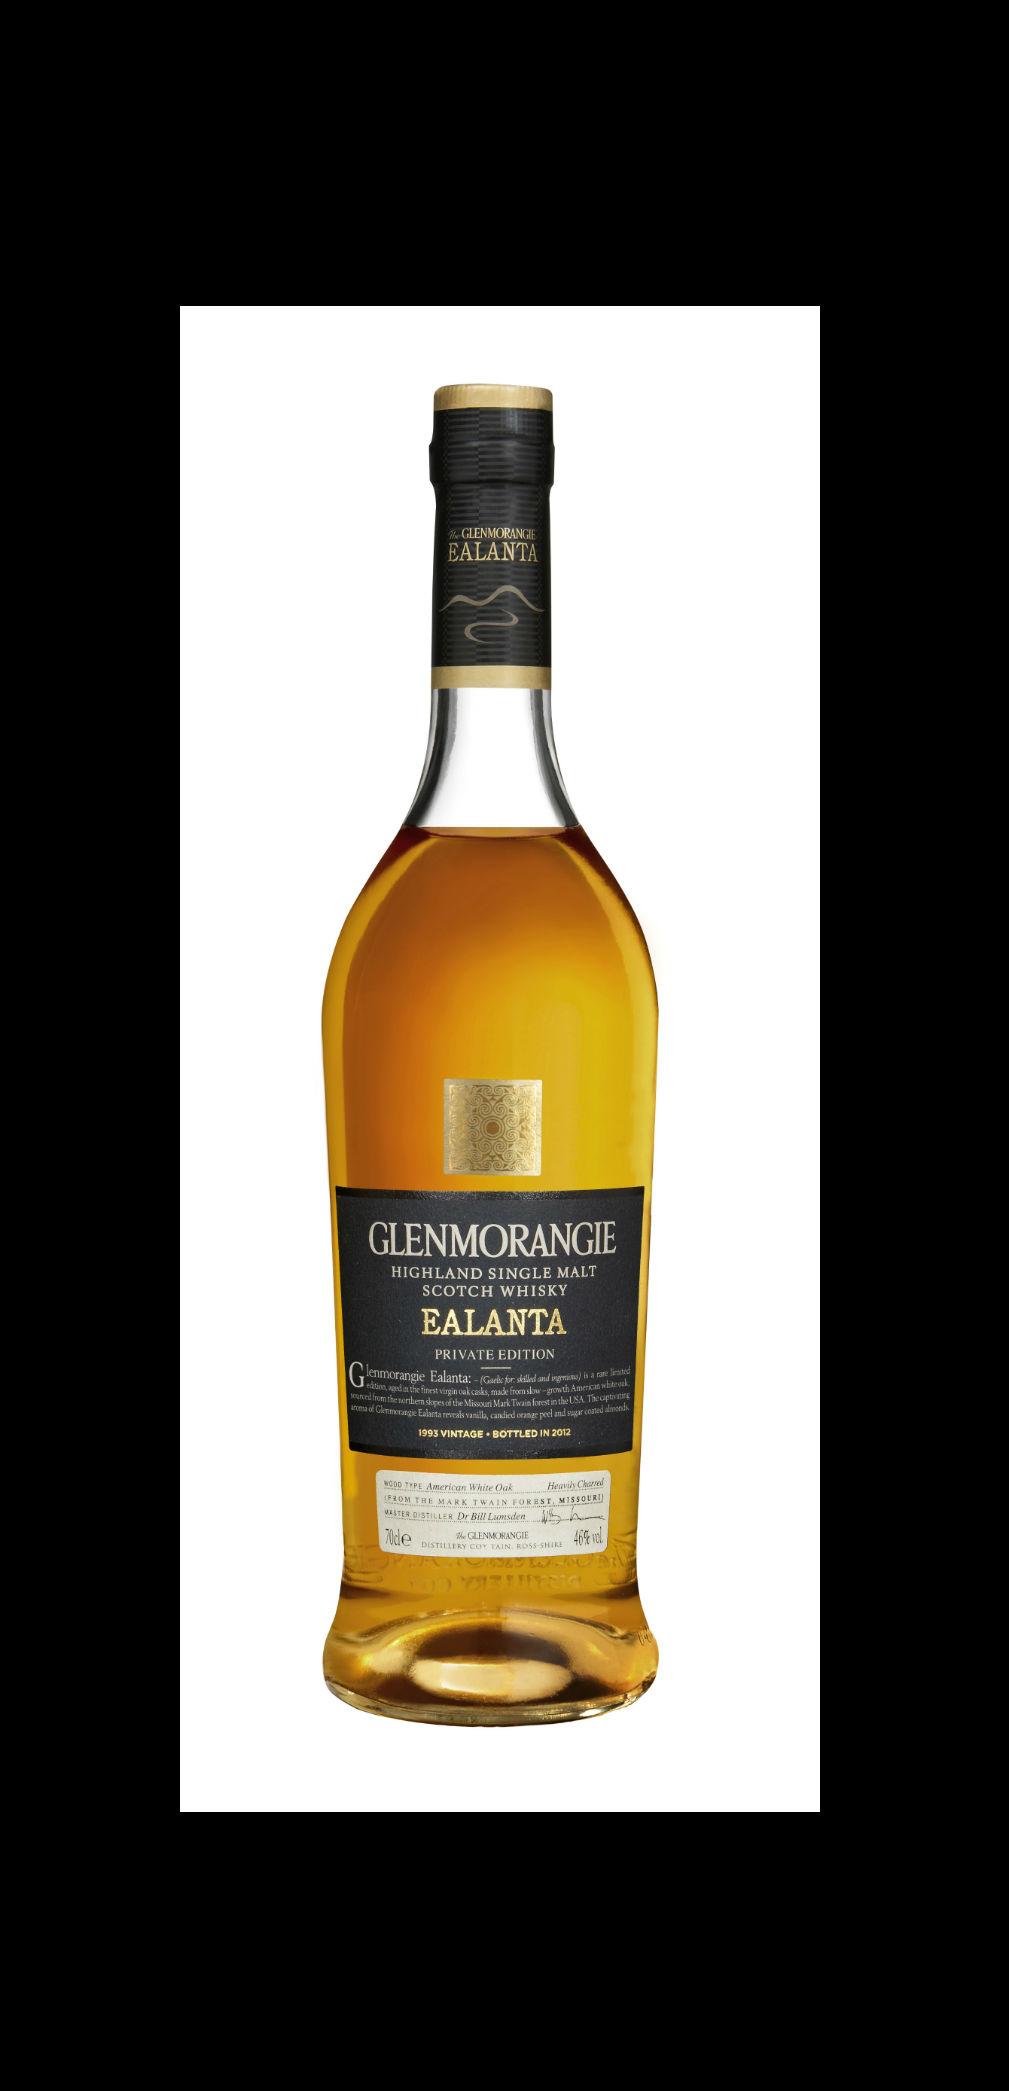 Ealanta1